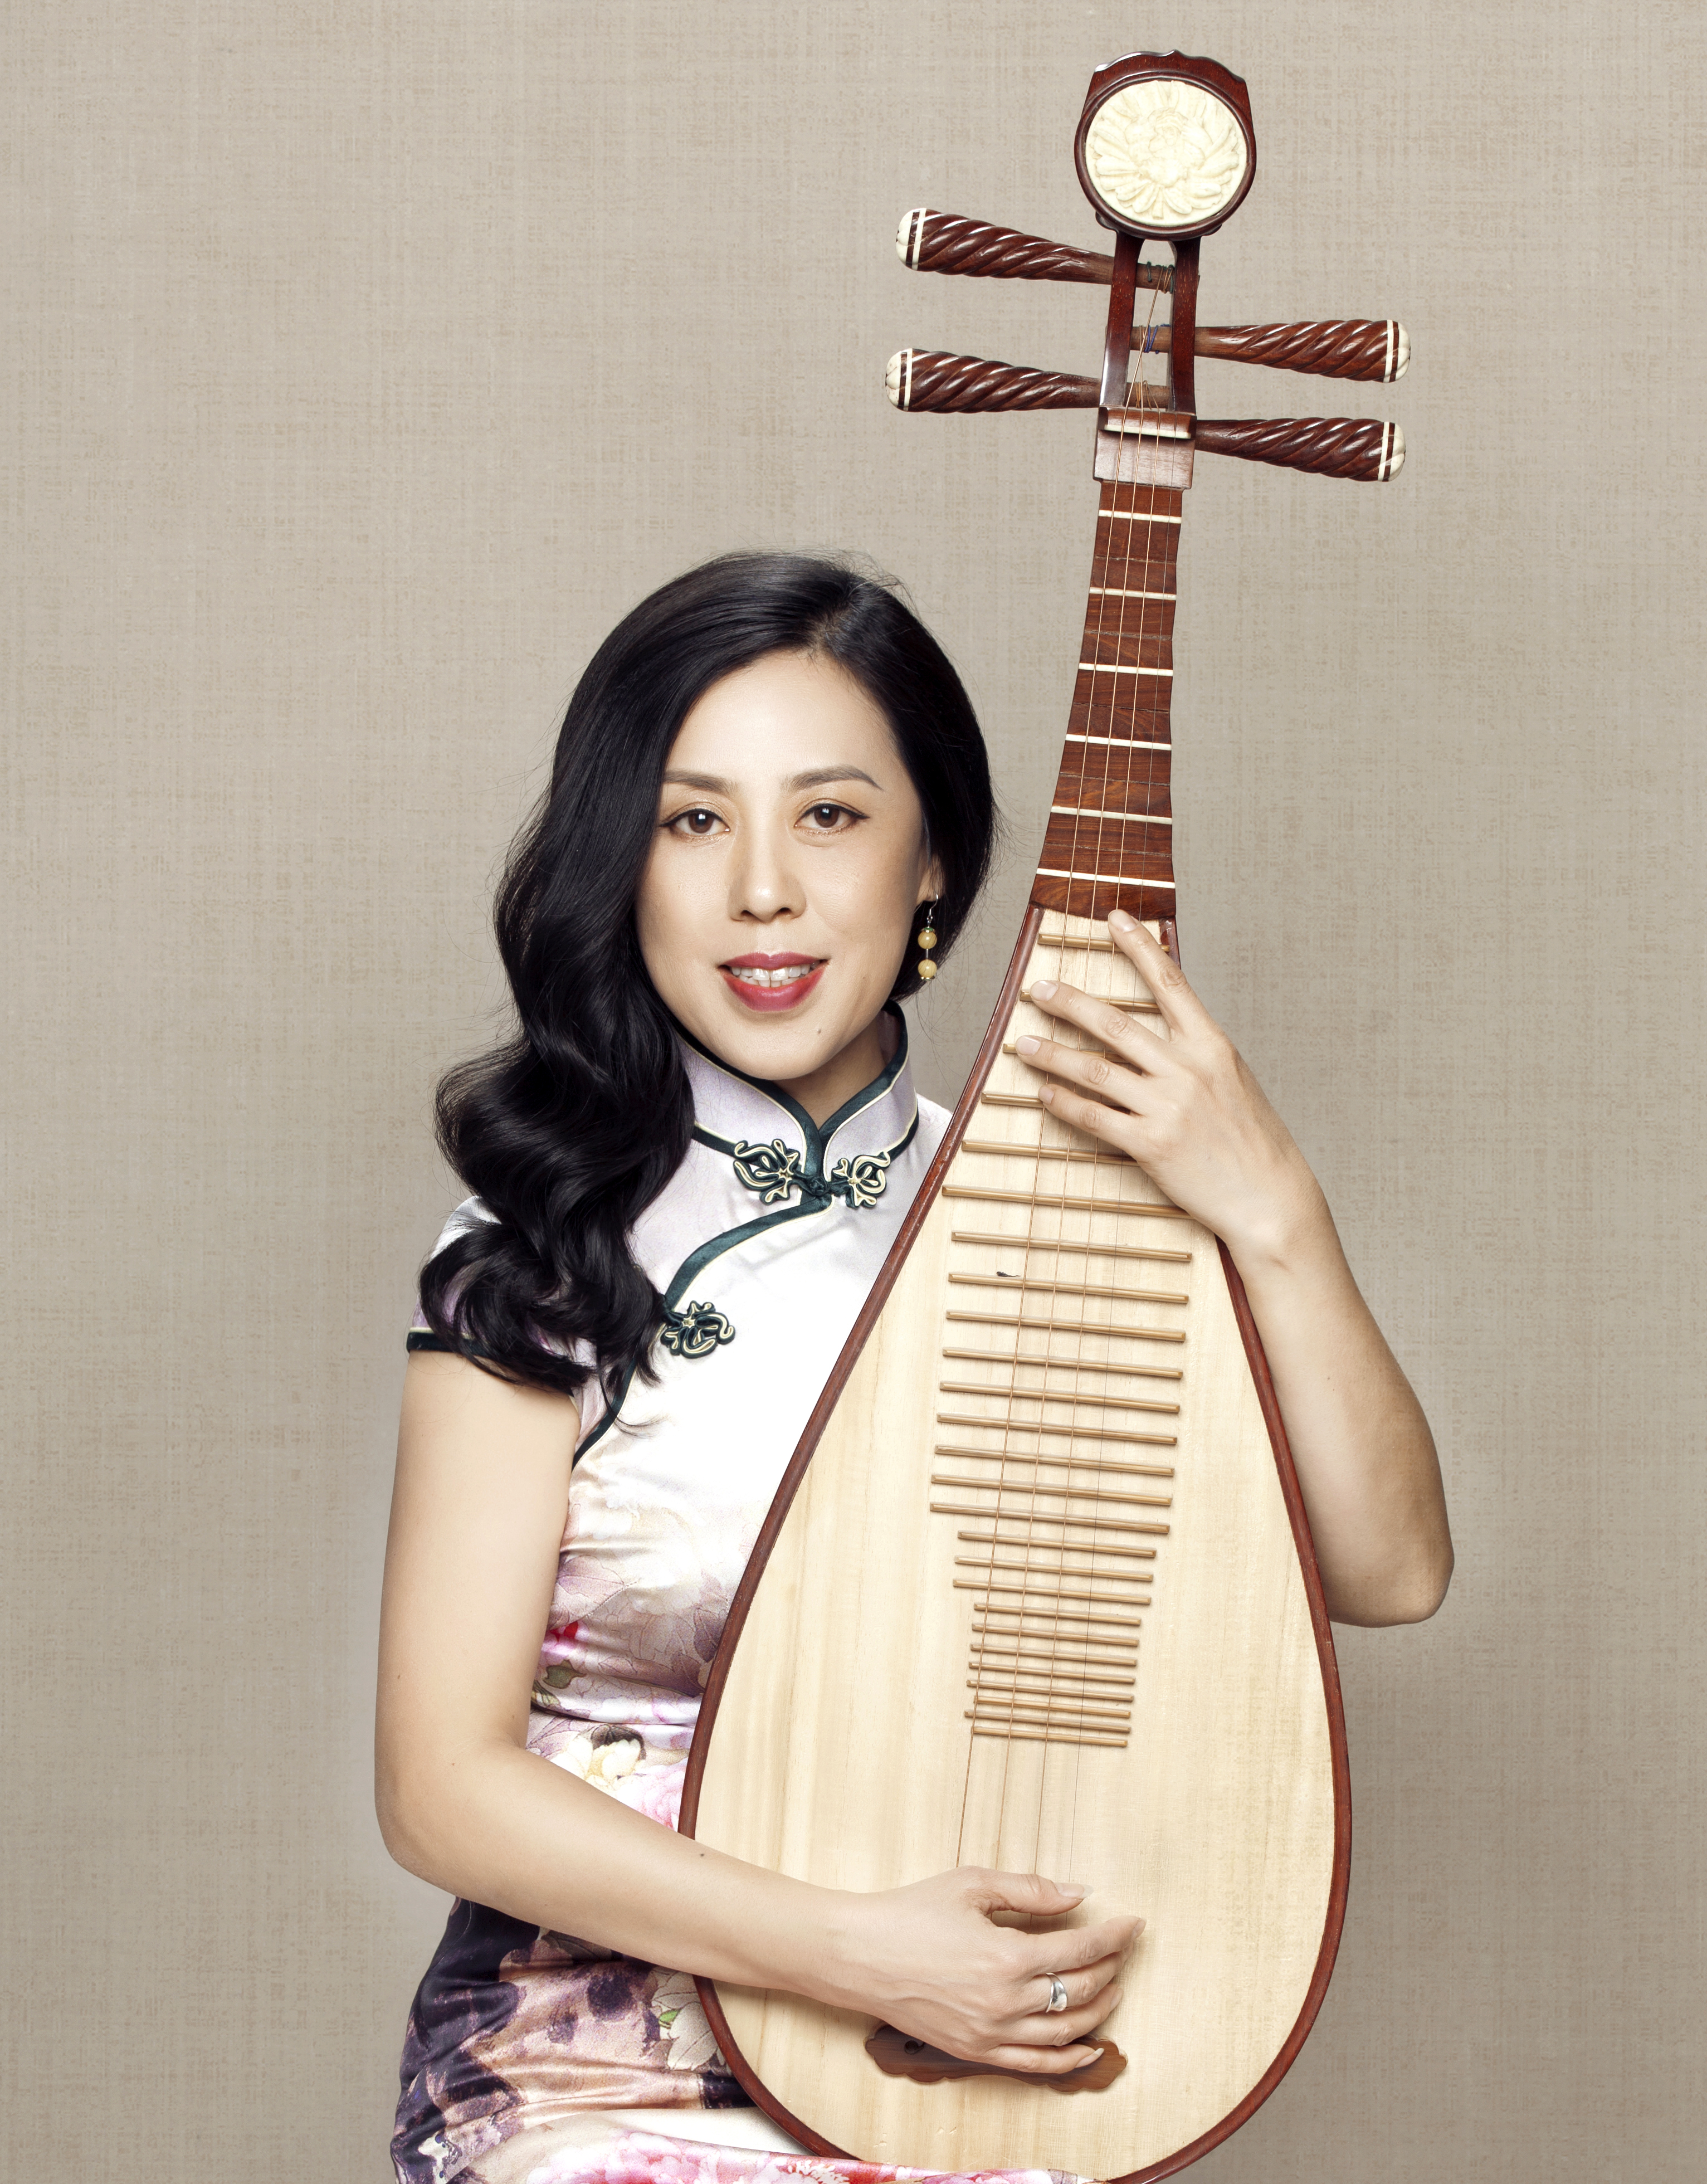 silk-and-bamboo-pippa